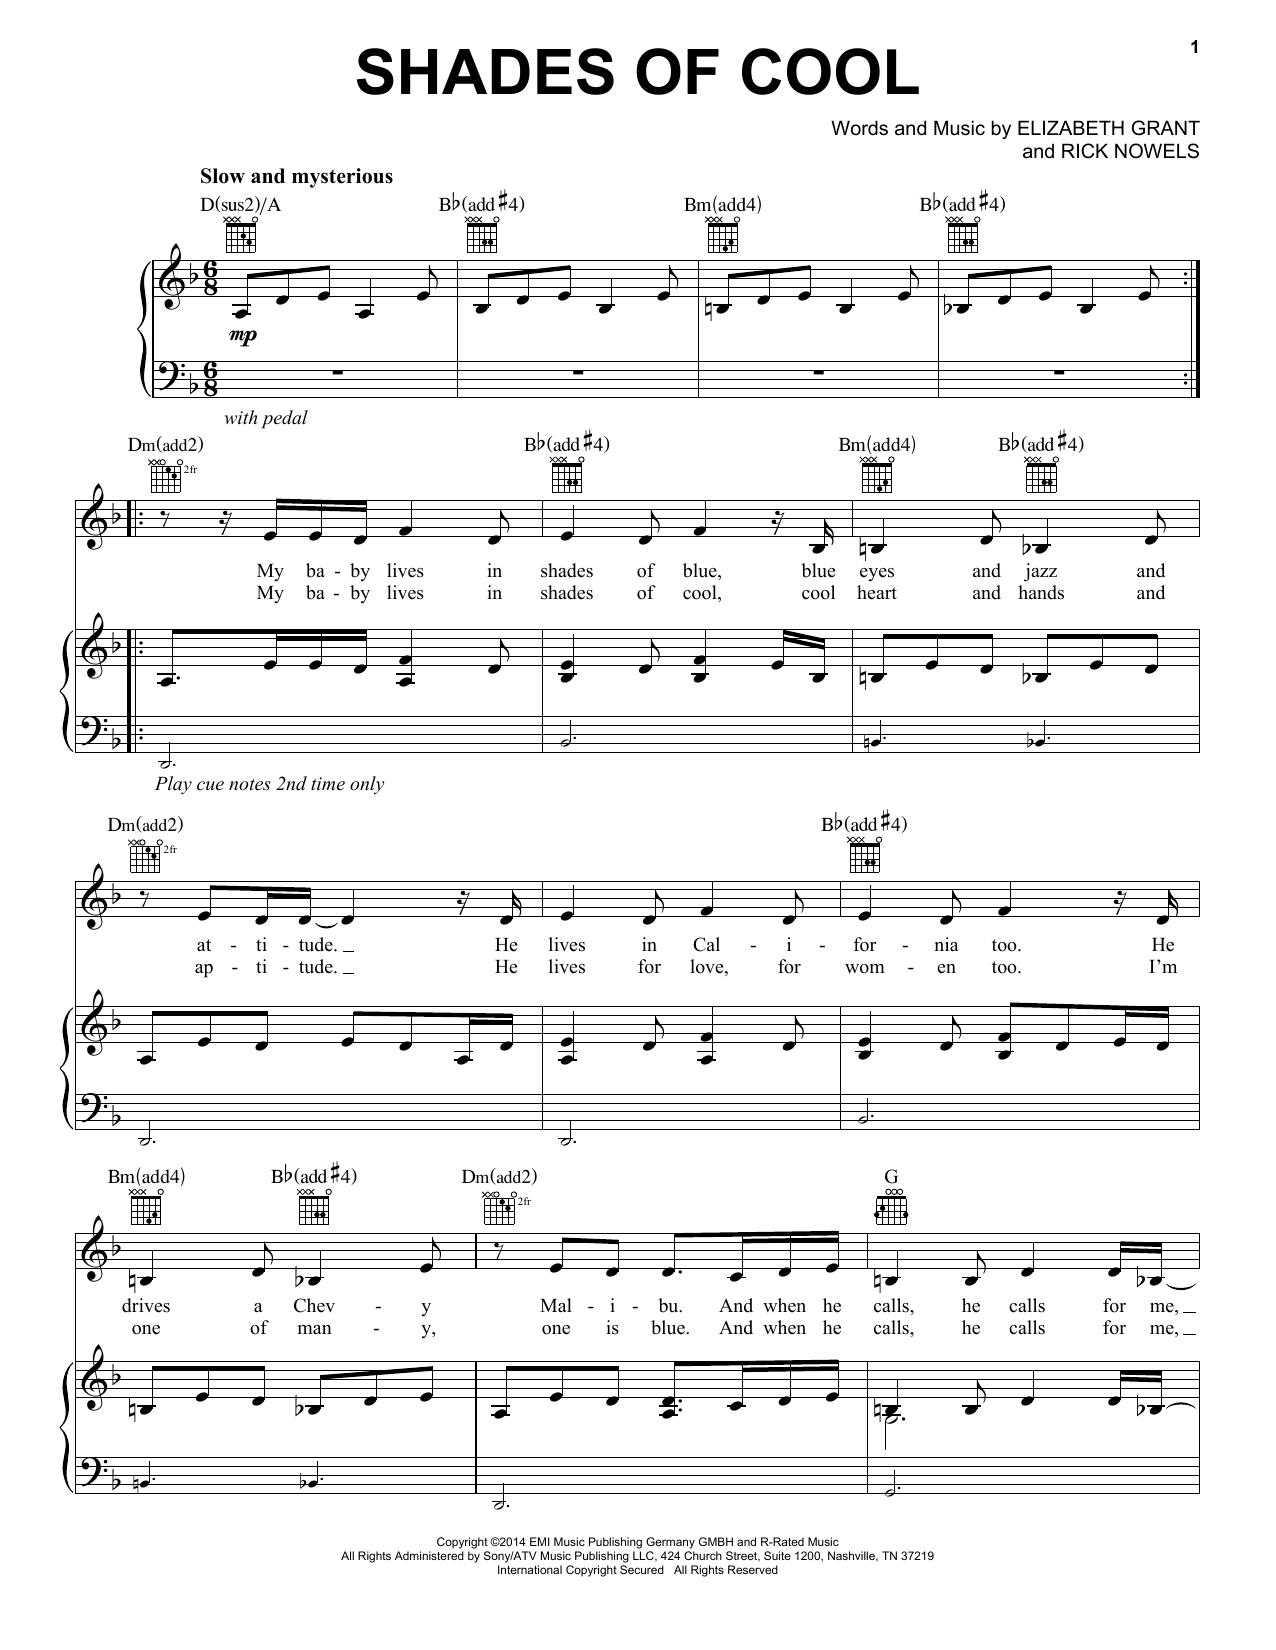 Sheet Music Digital Files To Print Licensed Lana Del Rey Digital